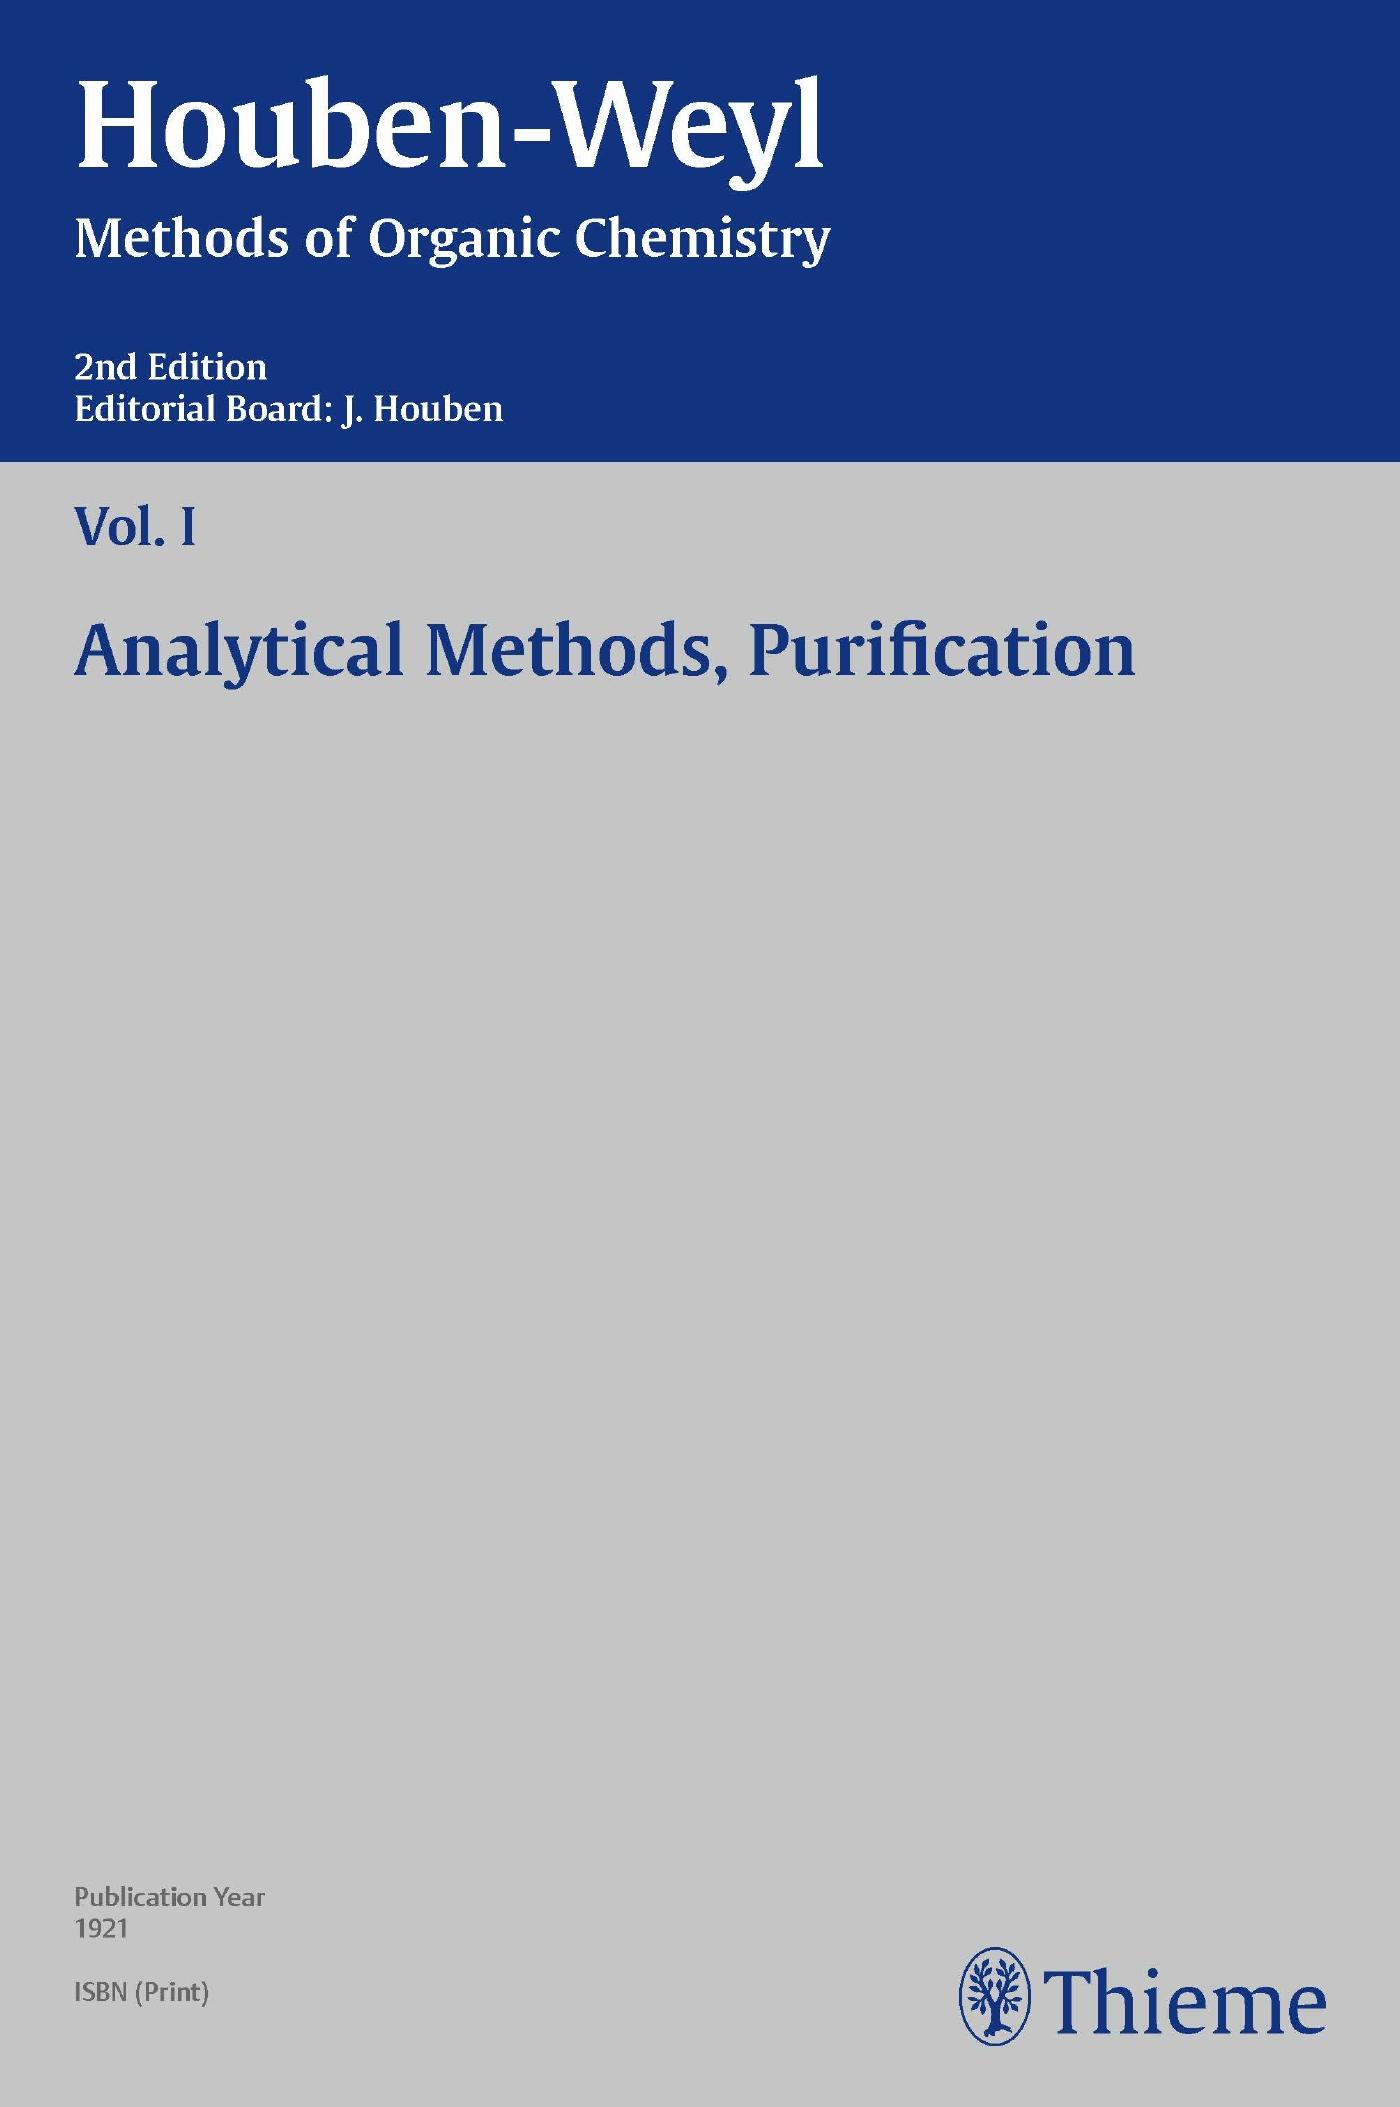 Houben-Weyl Methods of Organic Chemistry Vol. I, 2nd Edition